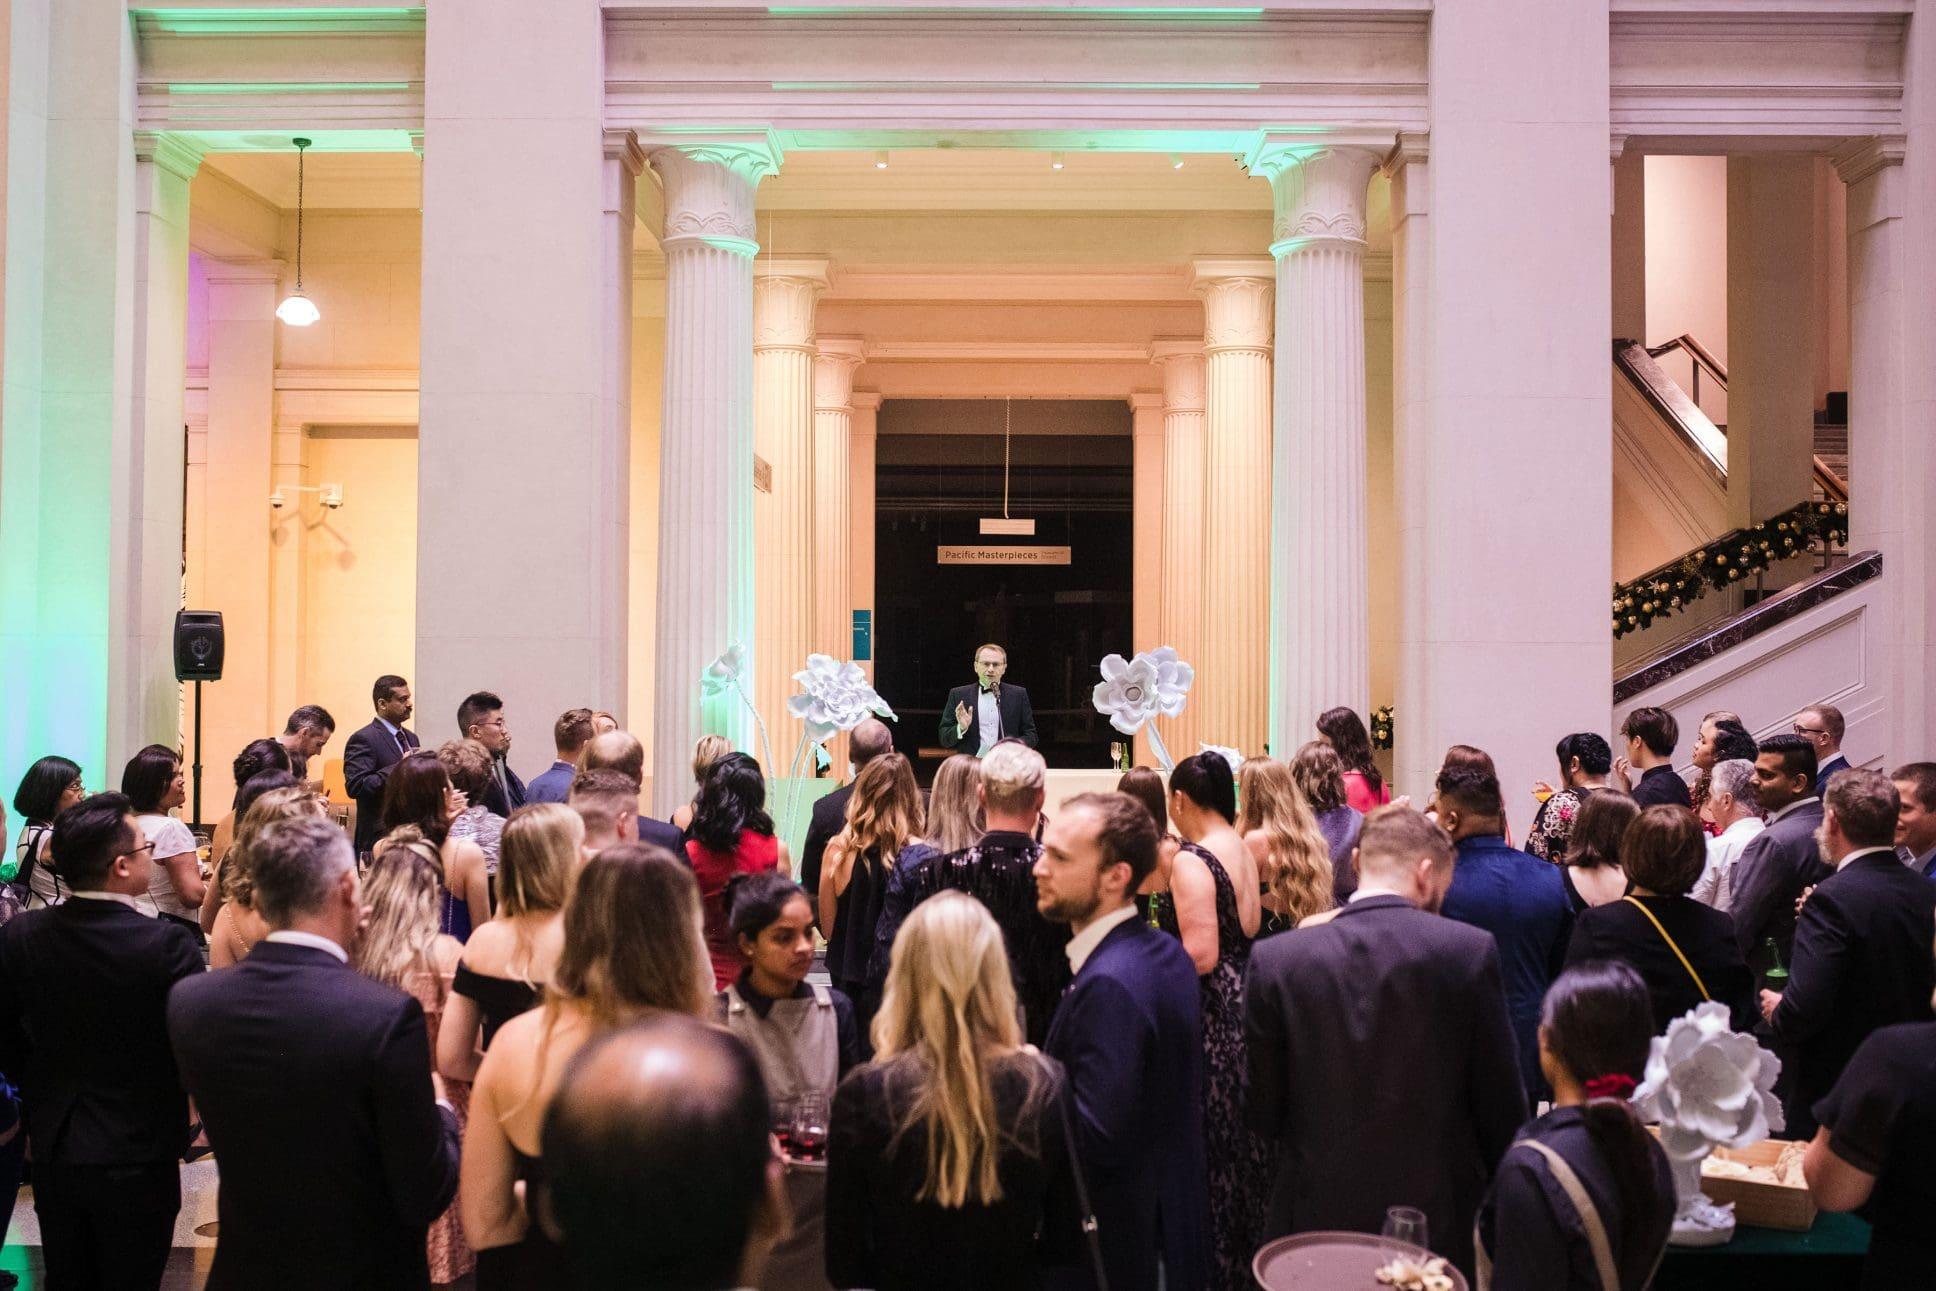 Grand Foyer event set up at Auckland War Memorial Museum.